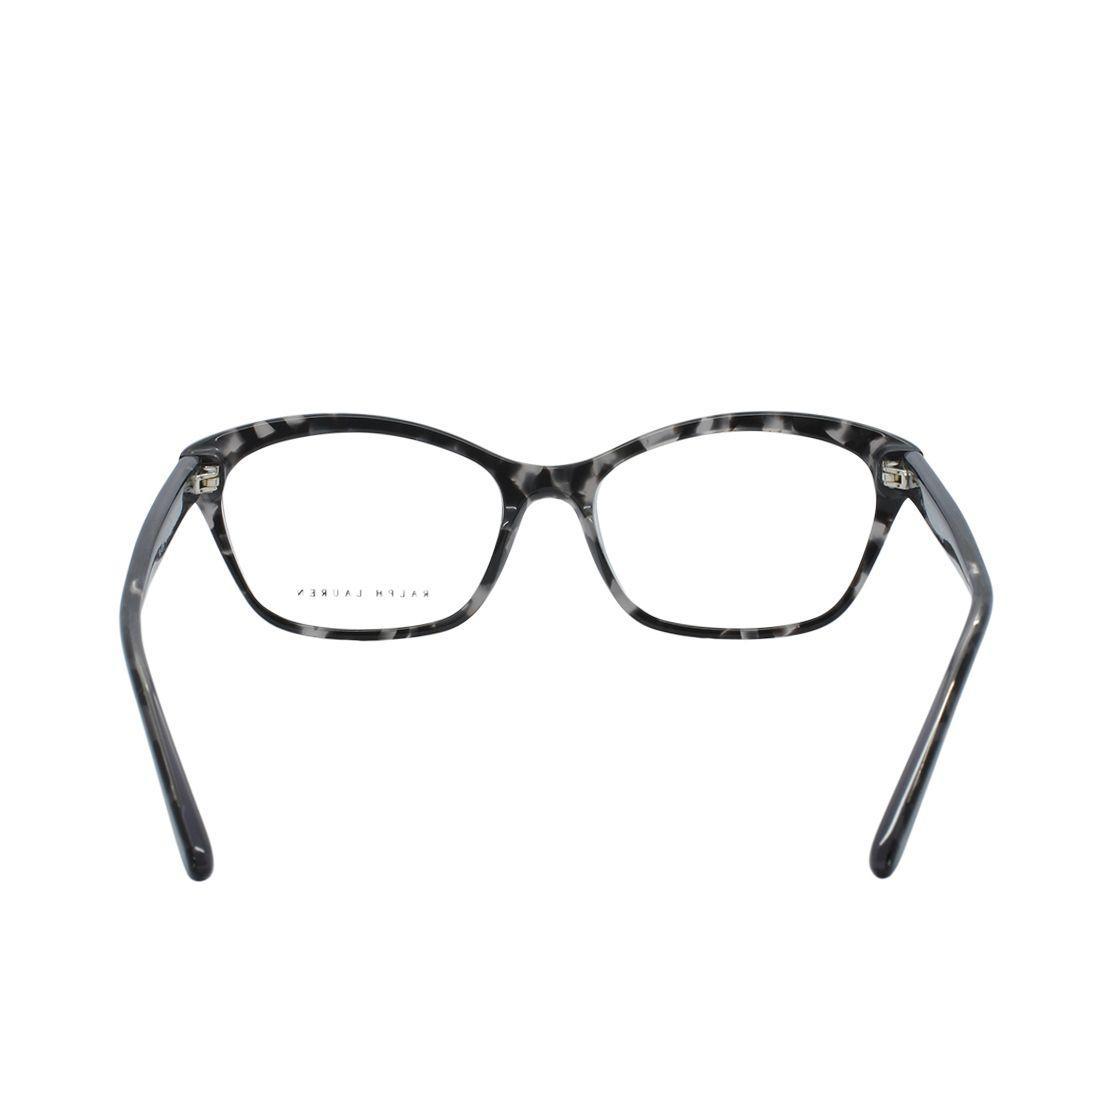 e8df11f4a Óculos de Grau Ralph Lauren Feminino RL6186 5745 - Acetato Tartaruga Cinza  R$ 601,00 à vista. Adicionar à sacola